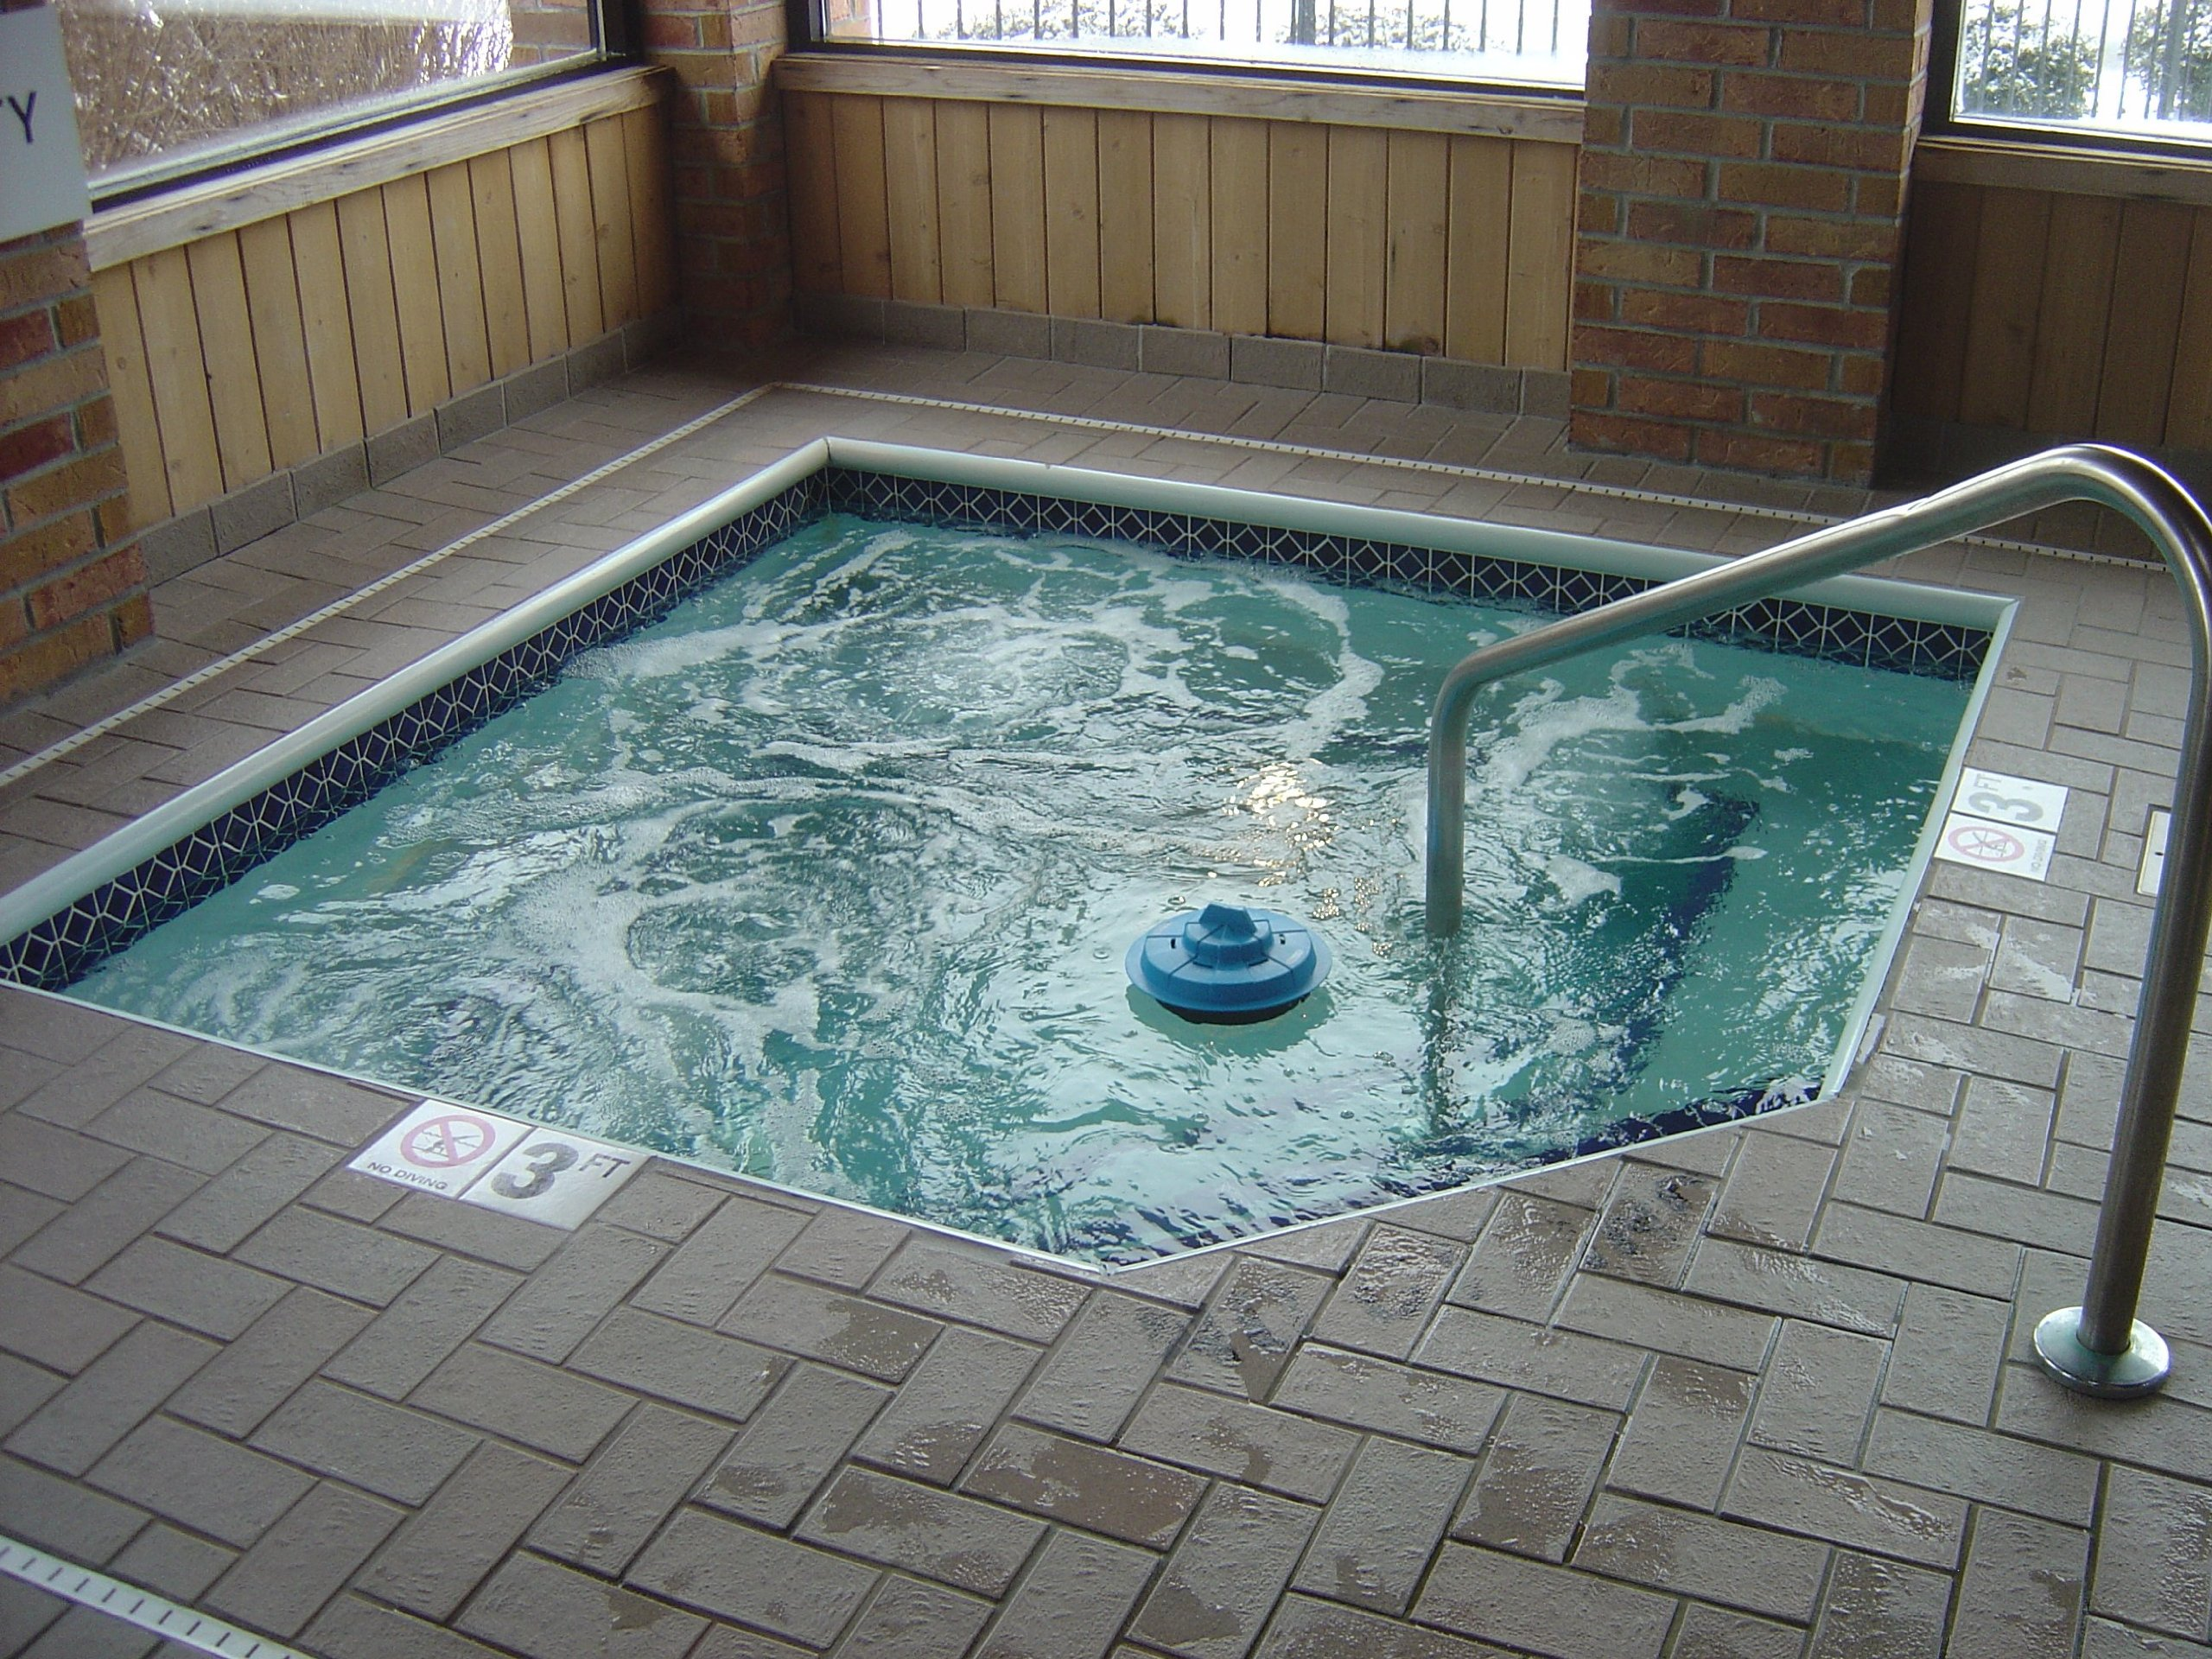 Pool Patrol PA-30 Pool Alarm by Pool Patrol